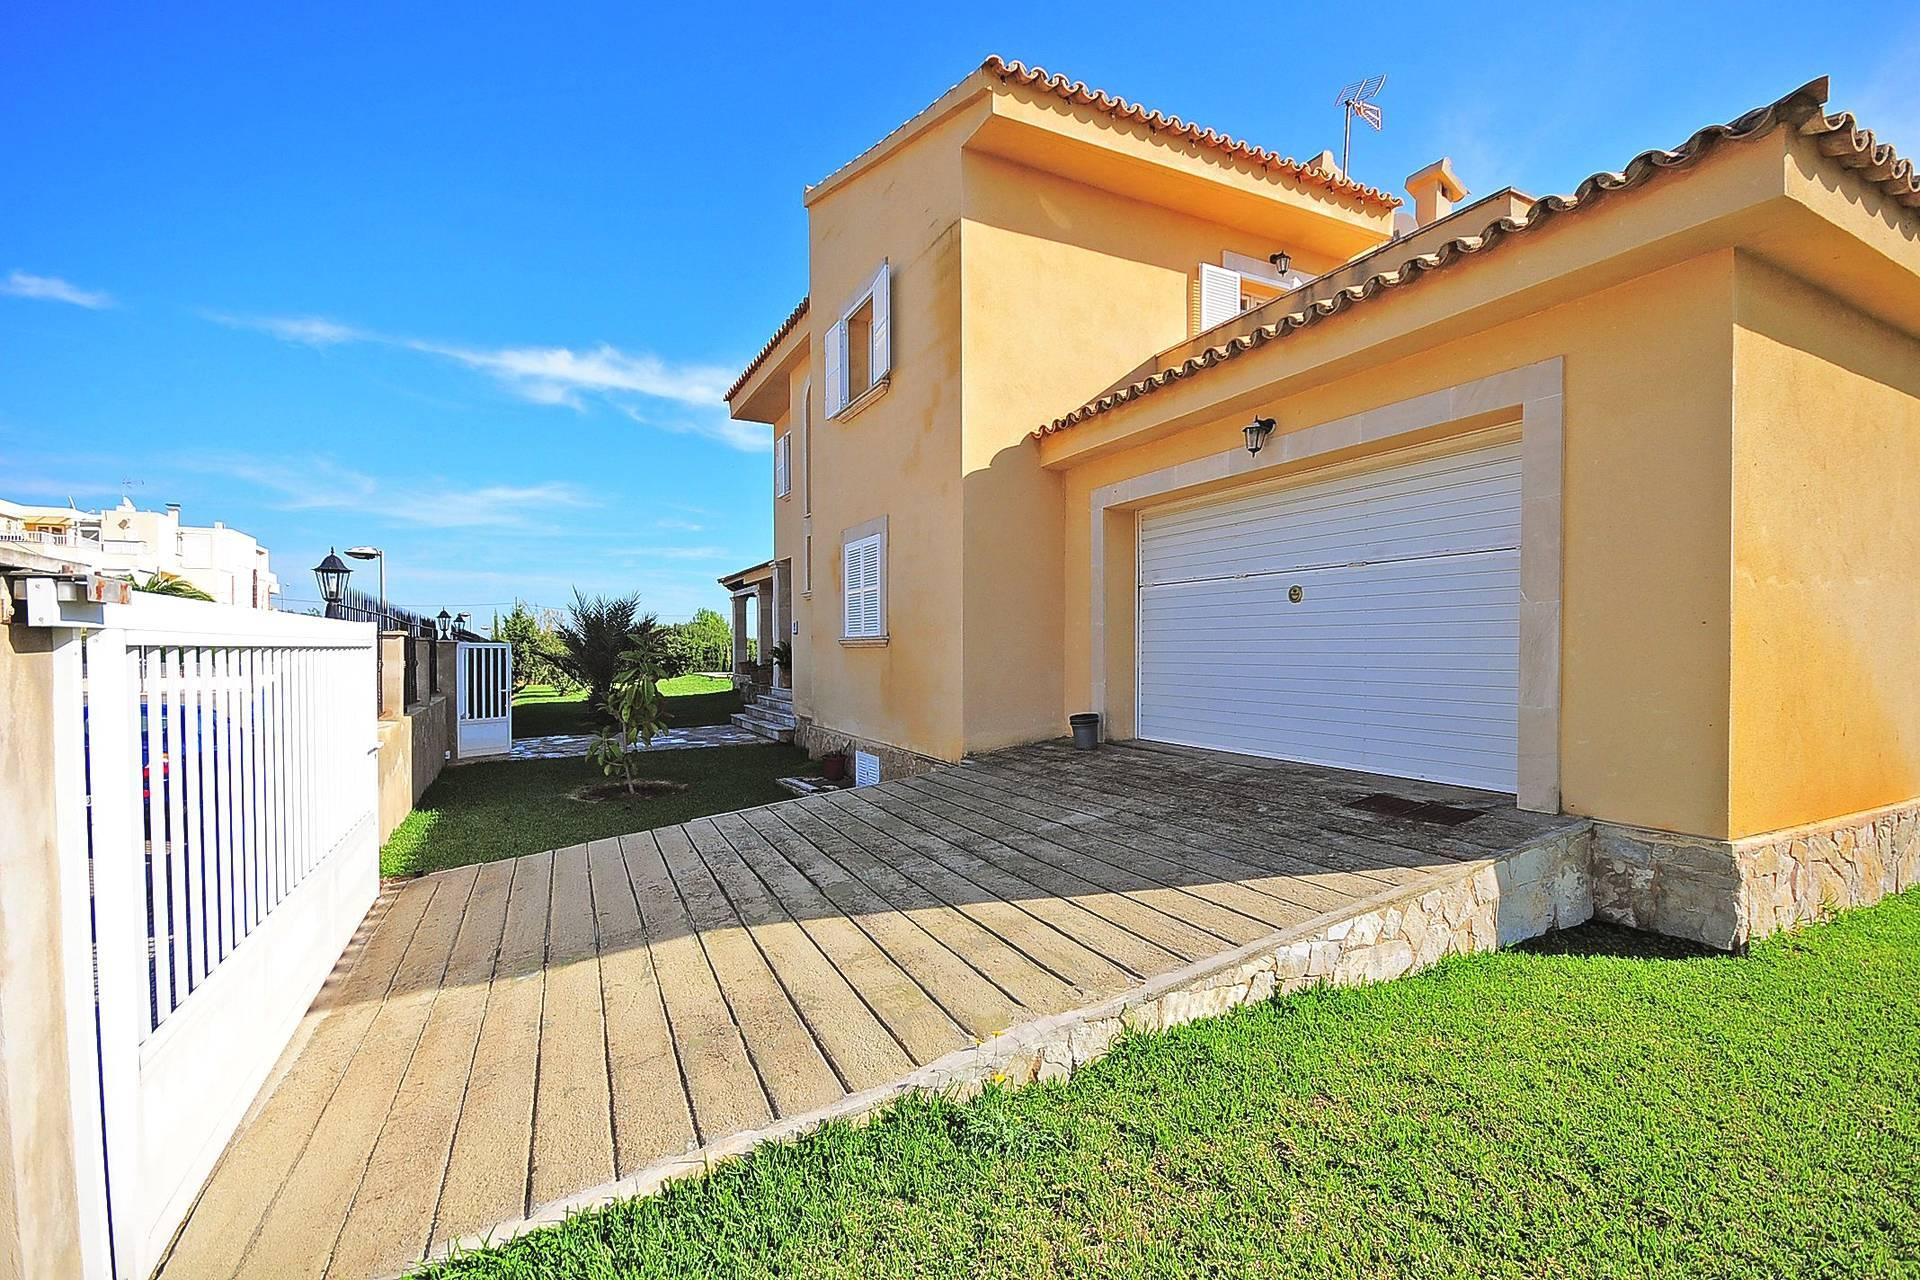 01-233 Ferienhaus am Strand Mallorca Norden Bild 3